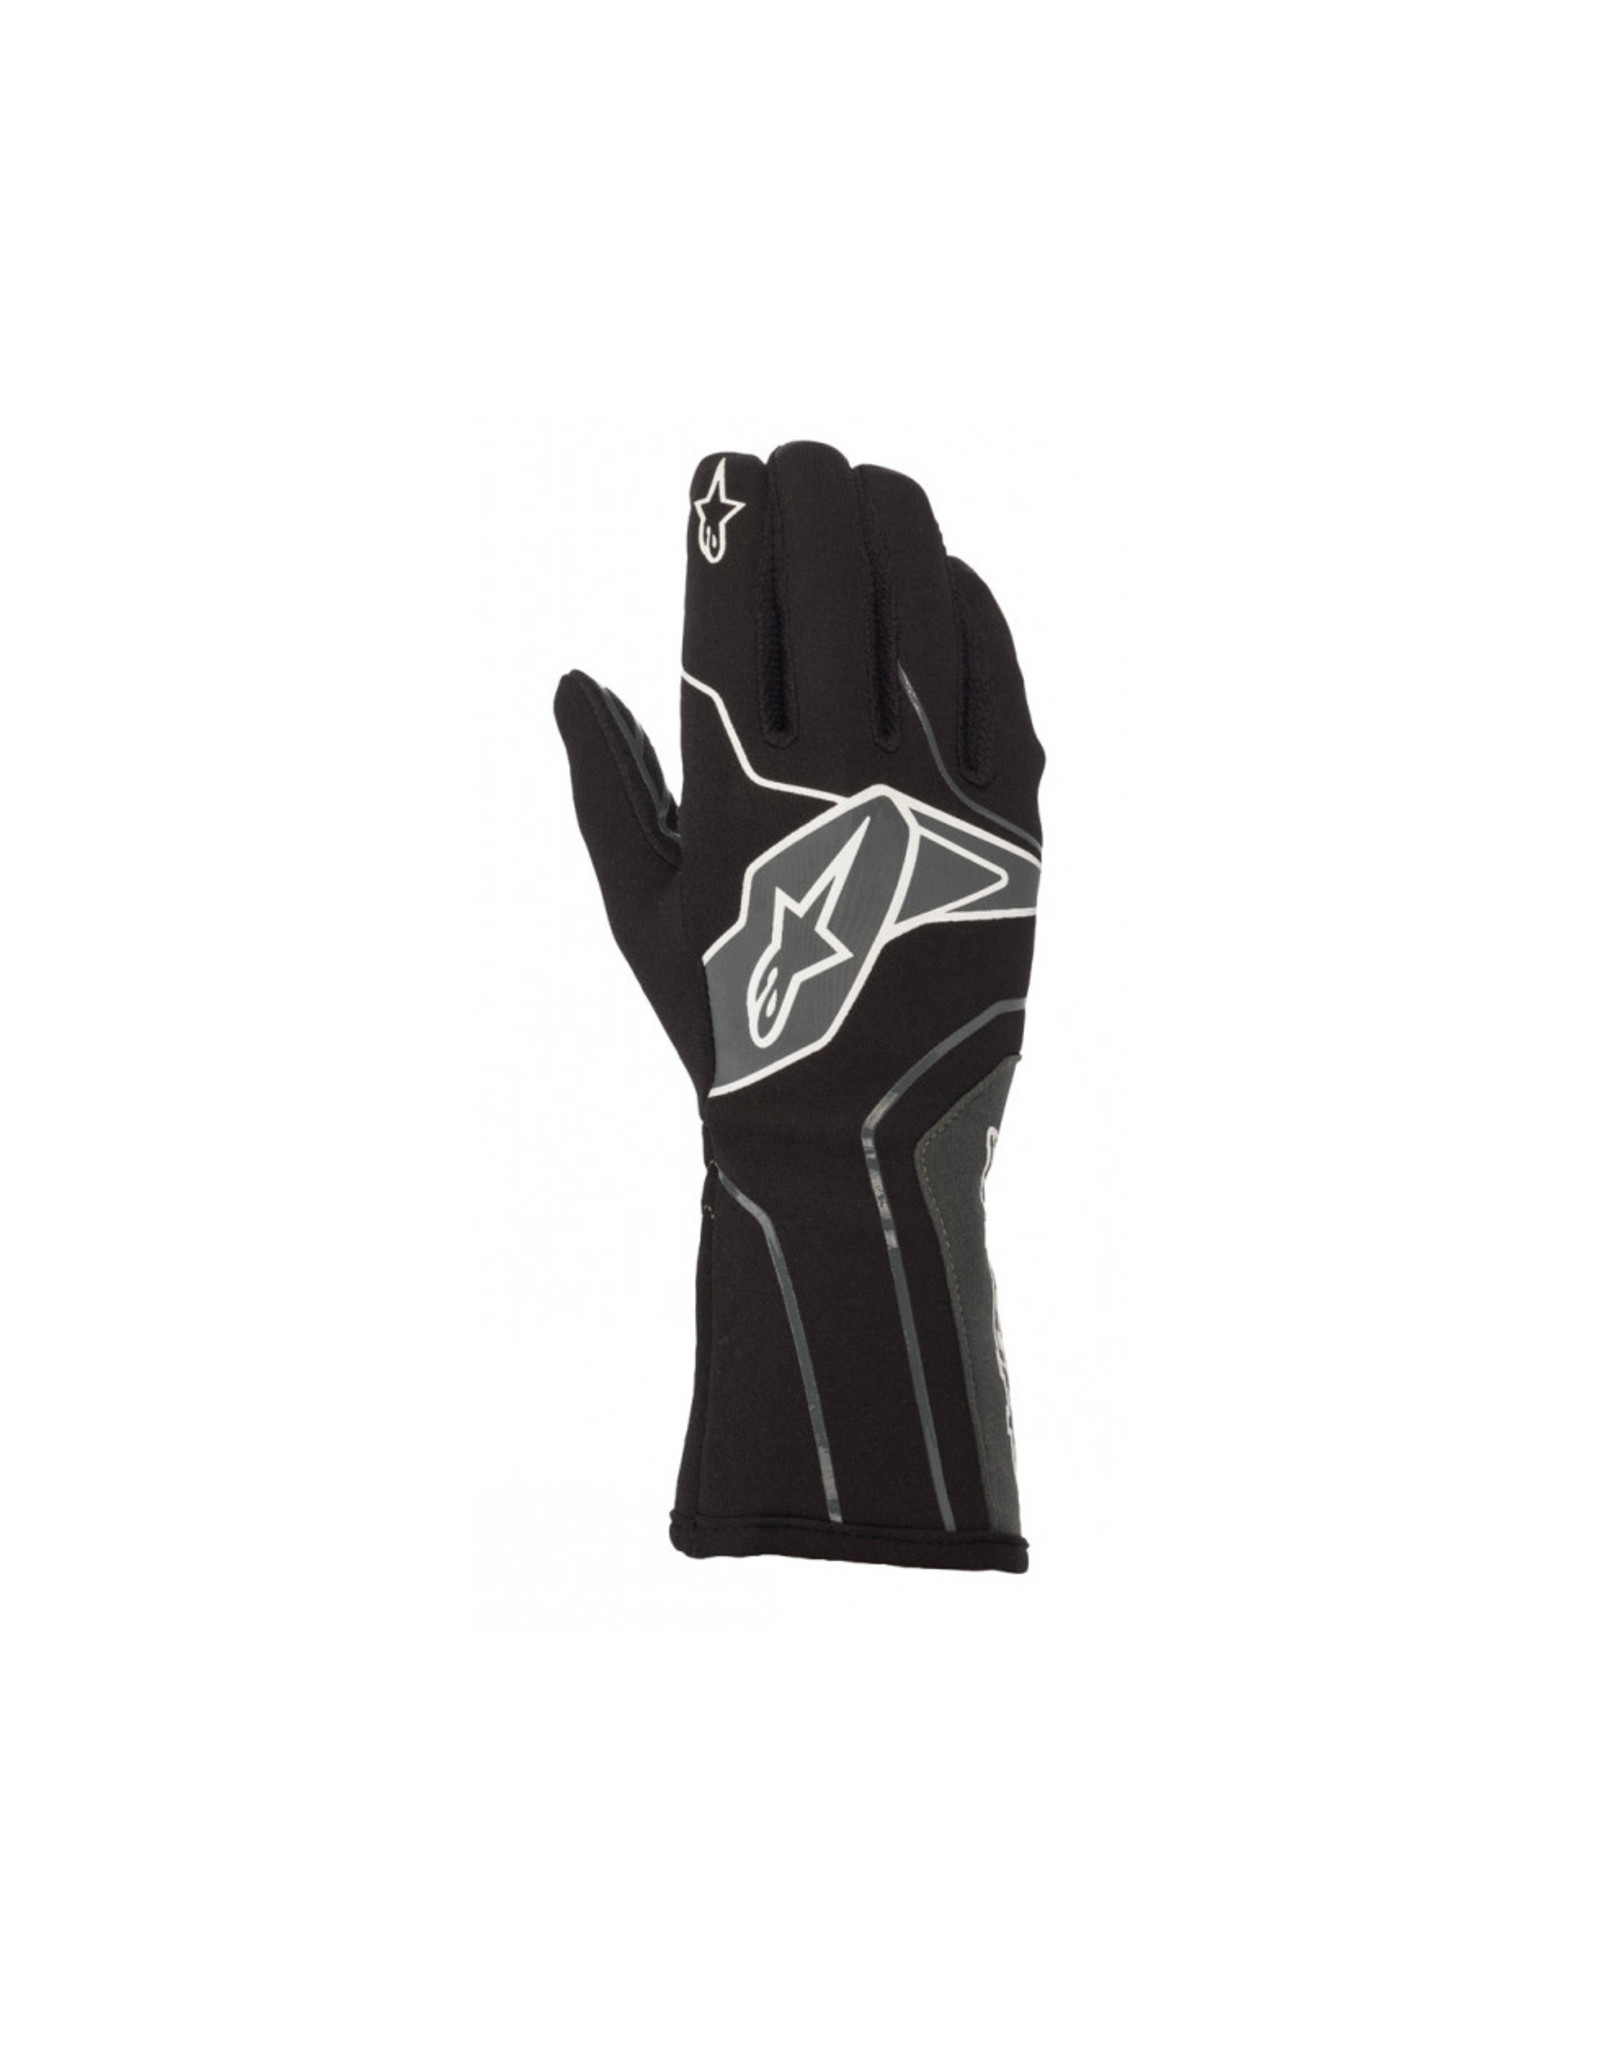 Alpinestars Alpinestars tech 1-K V2 glove zwart / antraciet